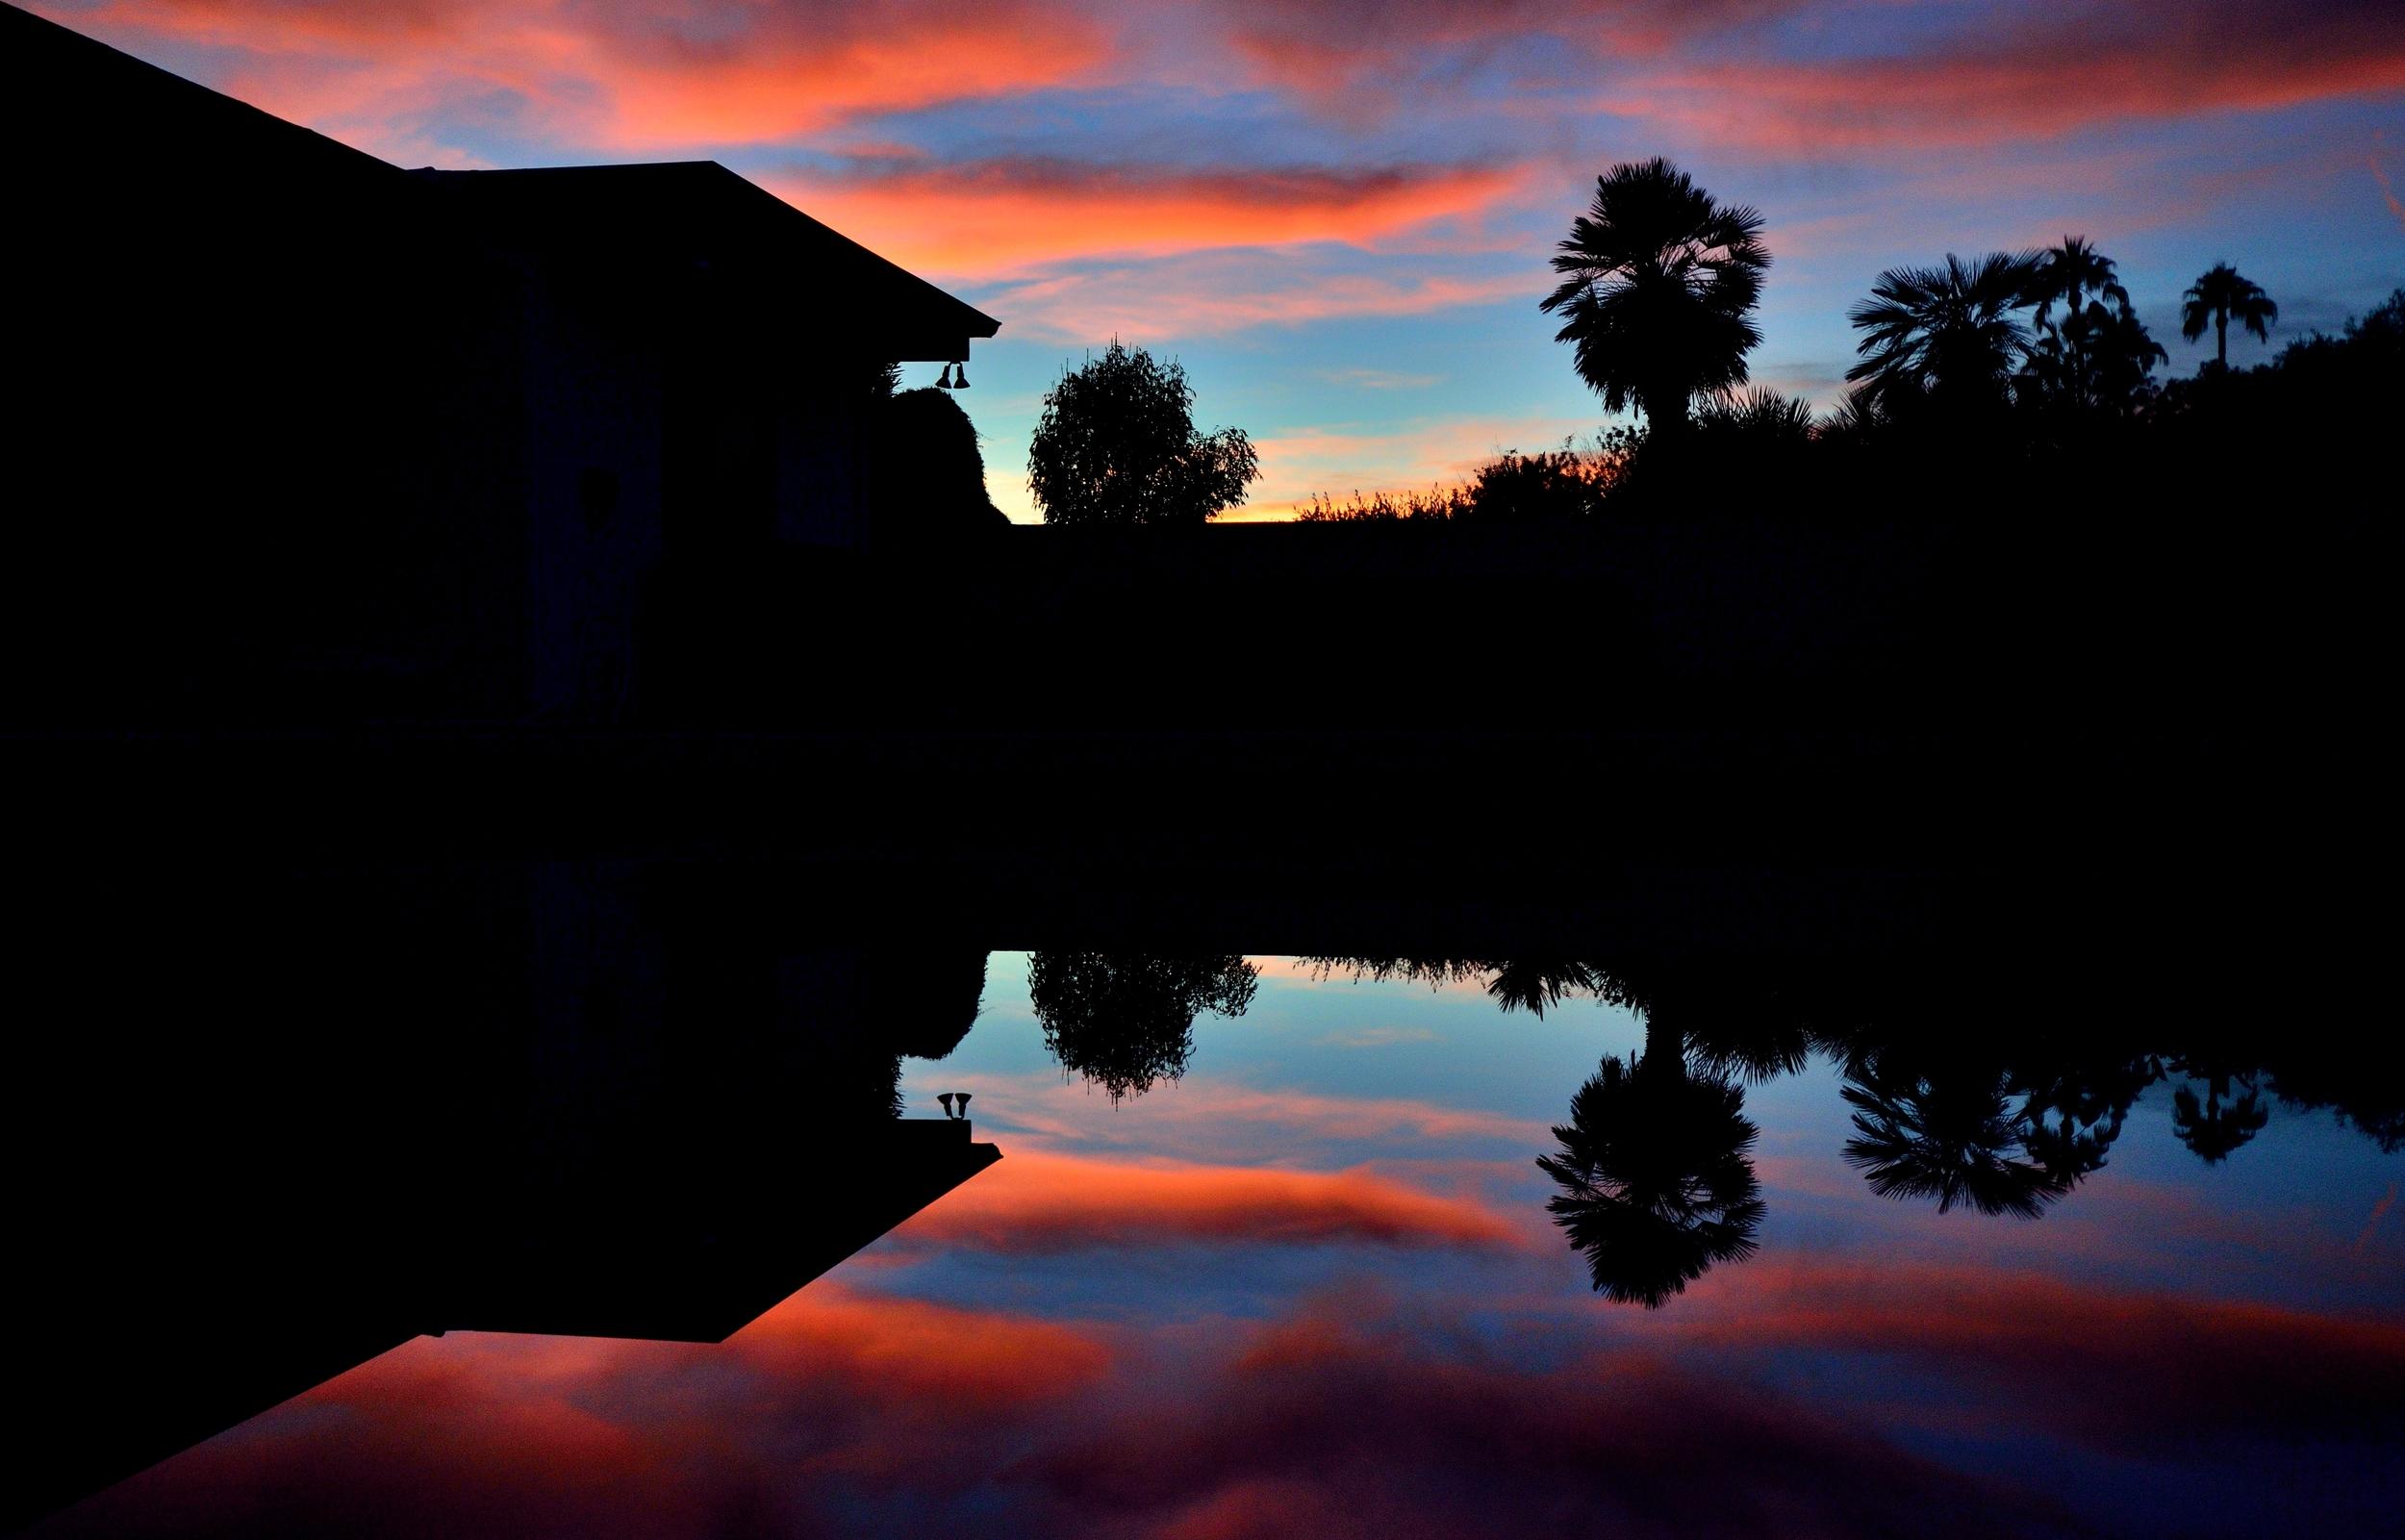 Sunset in Backyard12-10-15_38.jpg